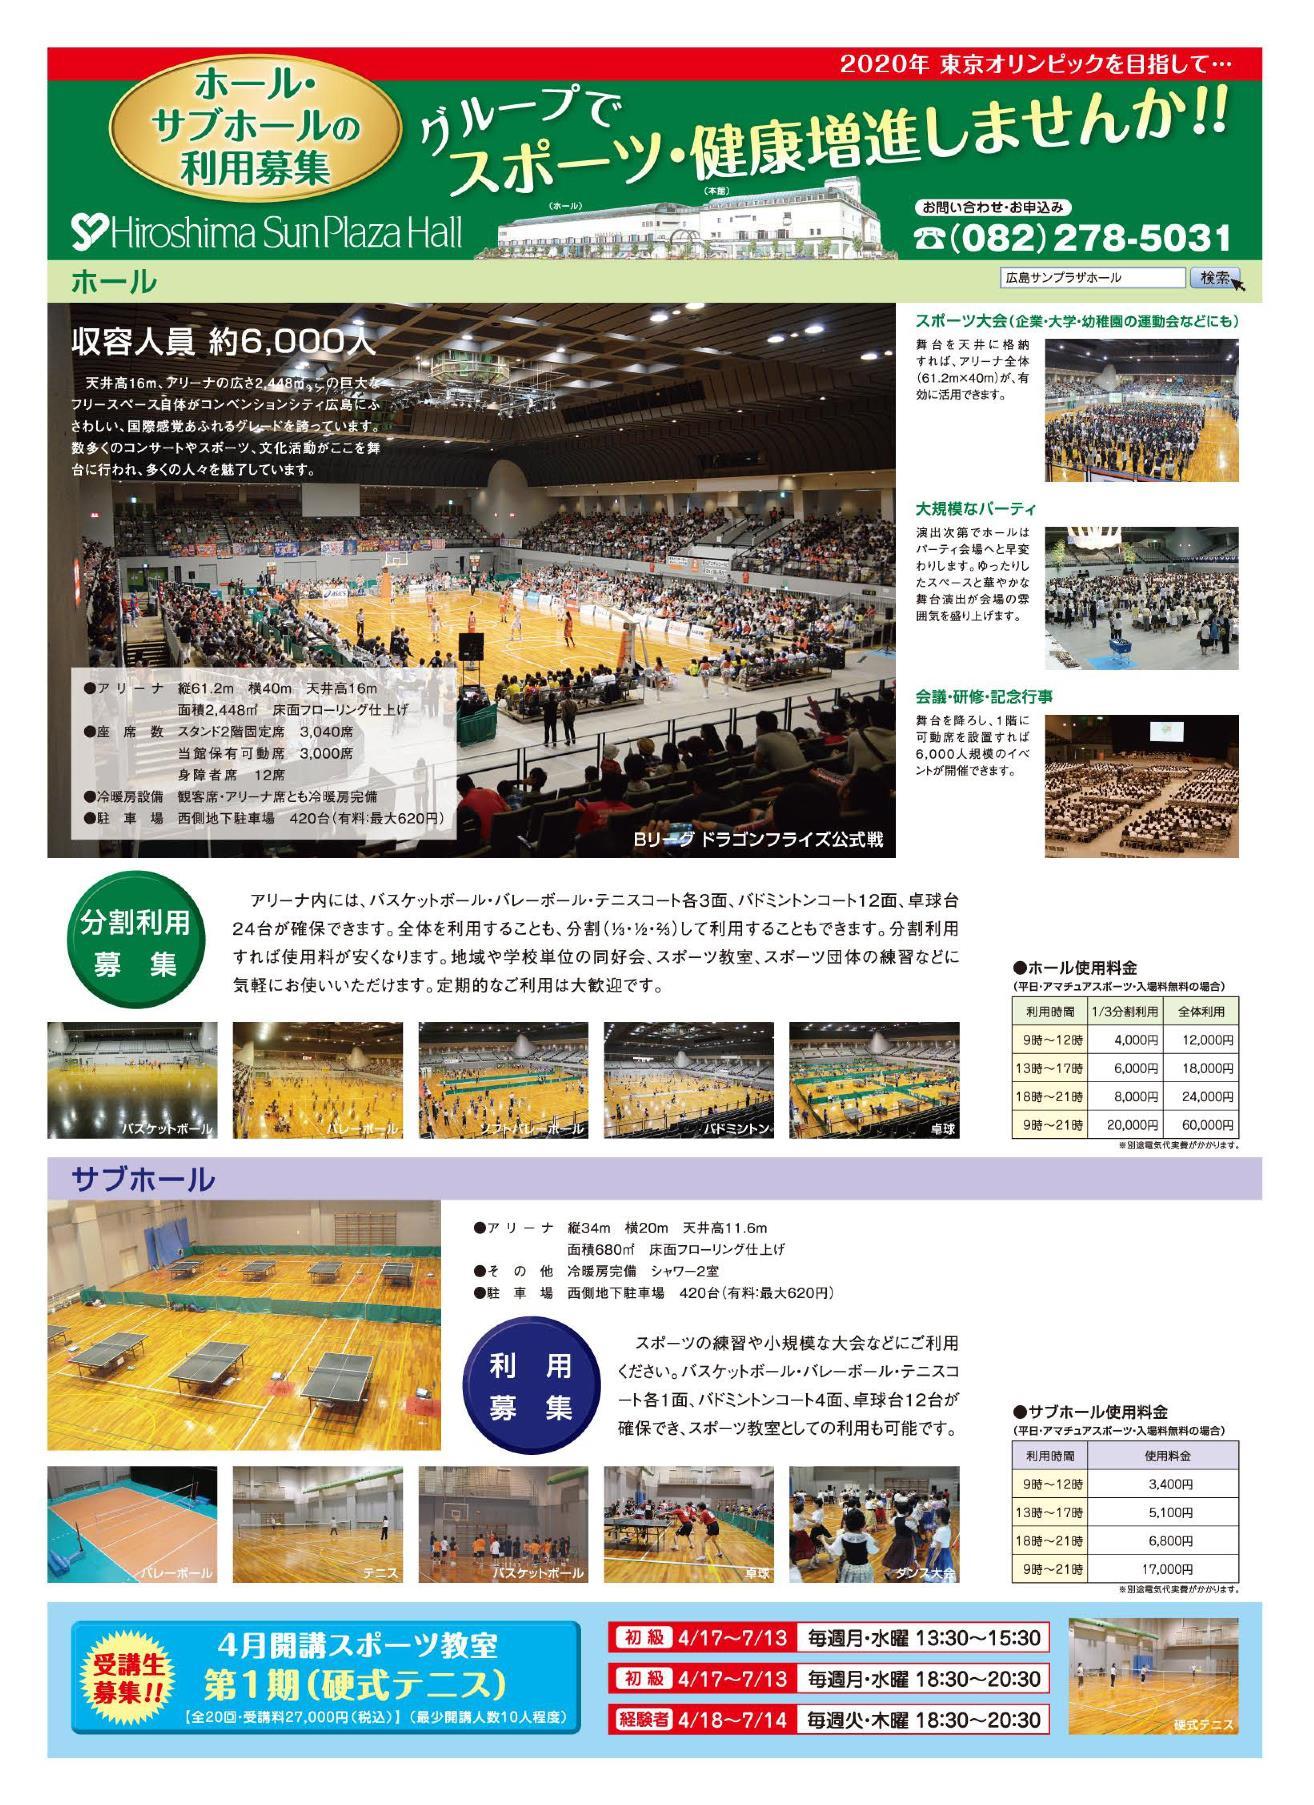 http://hiroshima-sunplaza.or.jp/blog/%E5%B9%B3%E6%88%9029%E5%B9%B4%E5%BA%A6%E3%83%9B%E3%83%BC%E3%83%ABweb.jpg